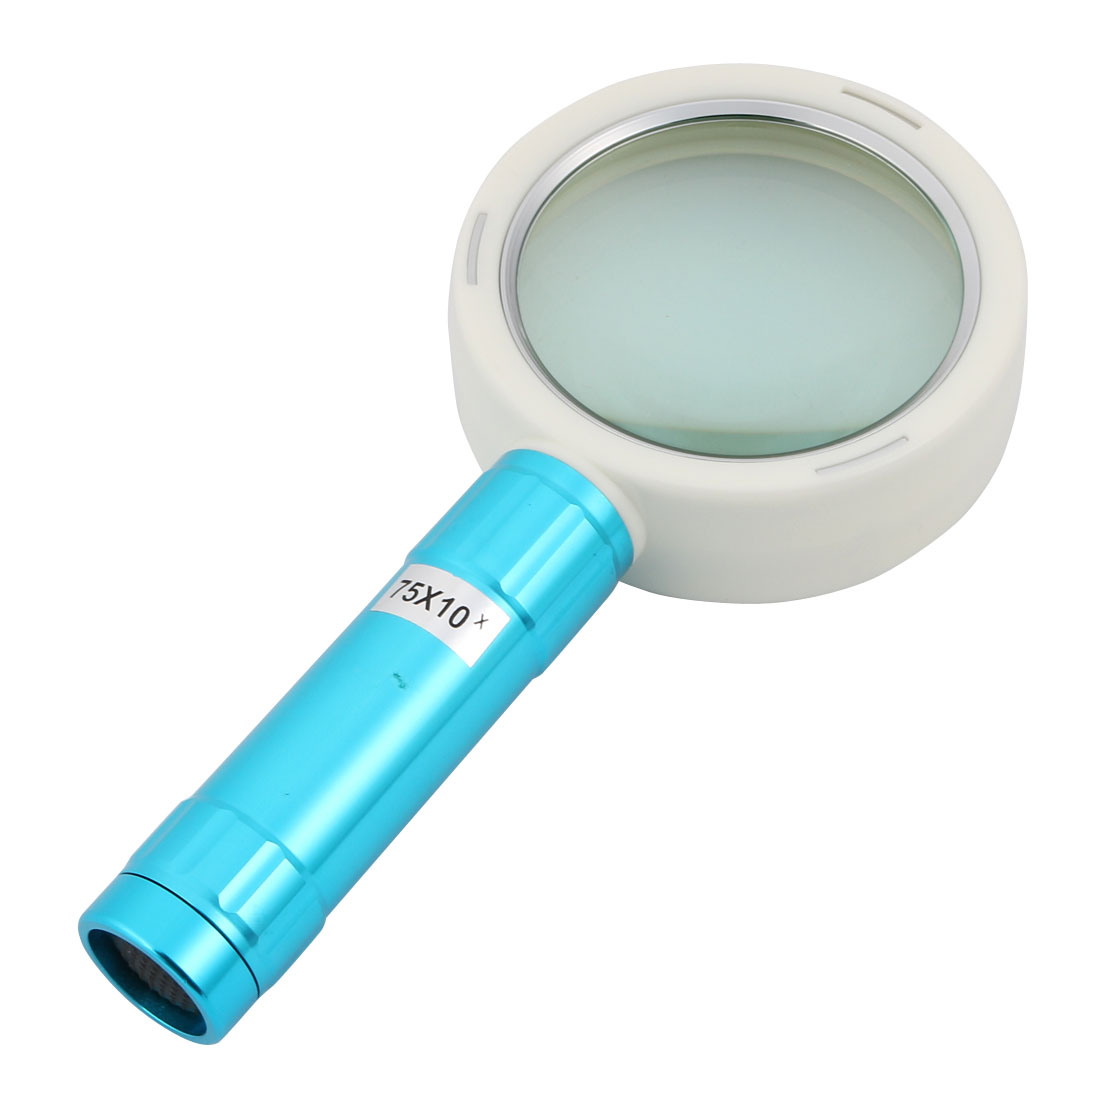 10 LED Light Blue Handle Illuminated Magnifier Magnifying Glass 10X